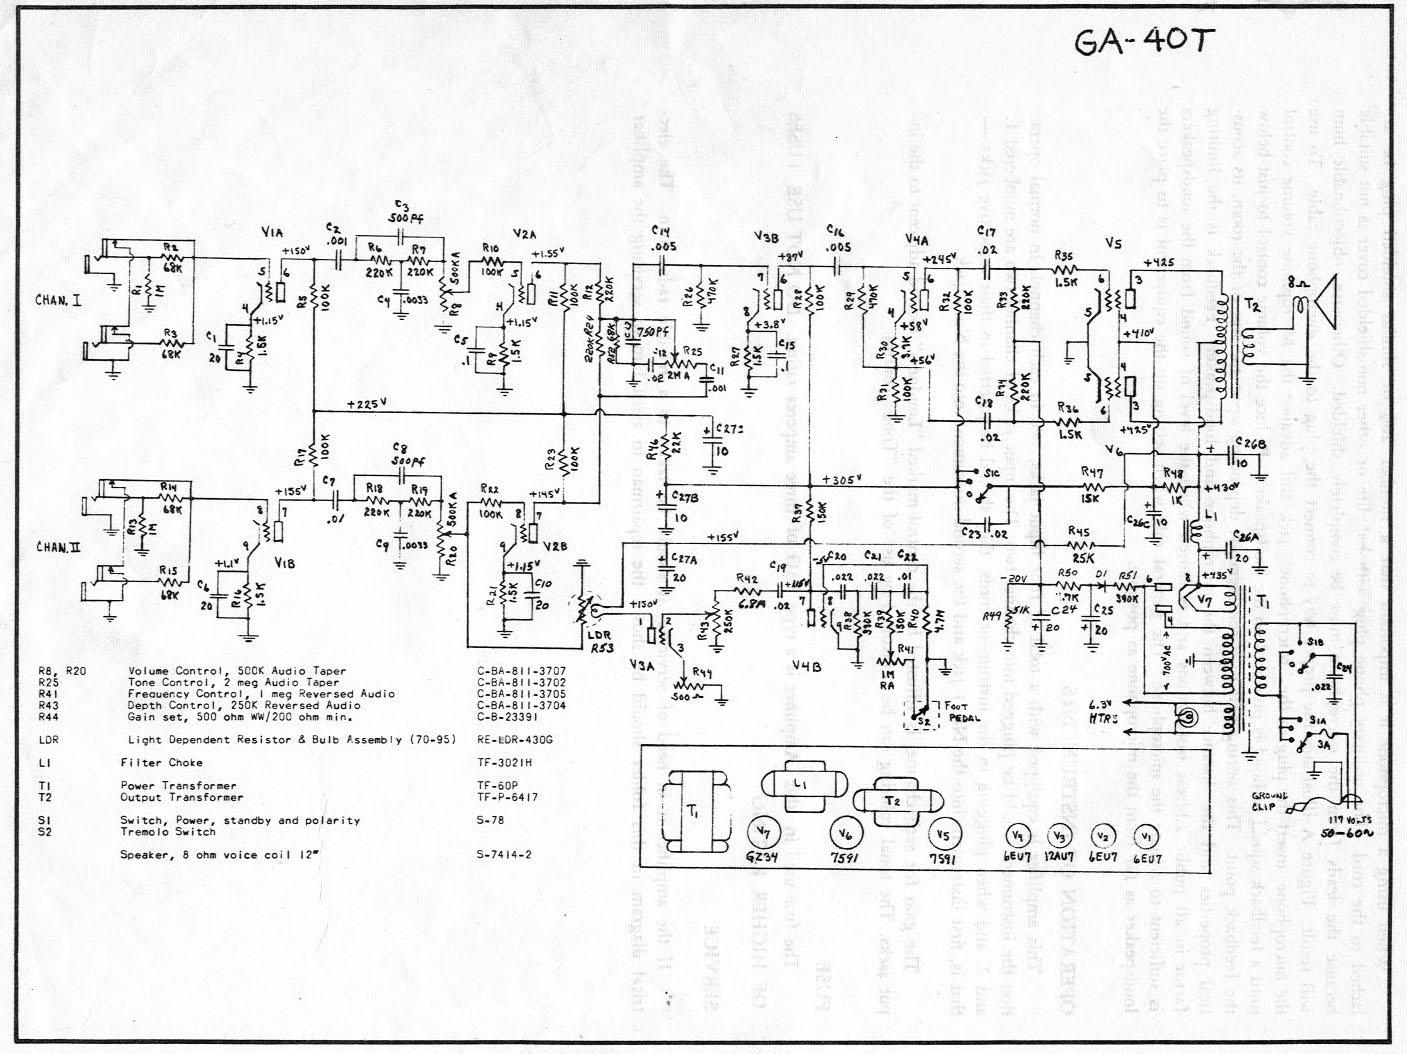 gibson guitar wiring diagrams 7mgte harness diagram les paul drawing at getdrawings free for